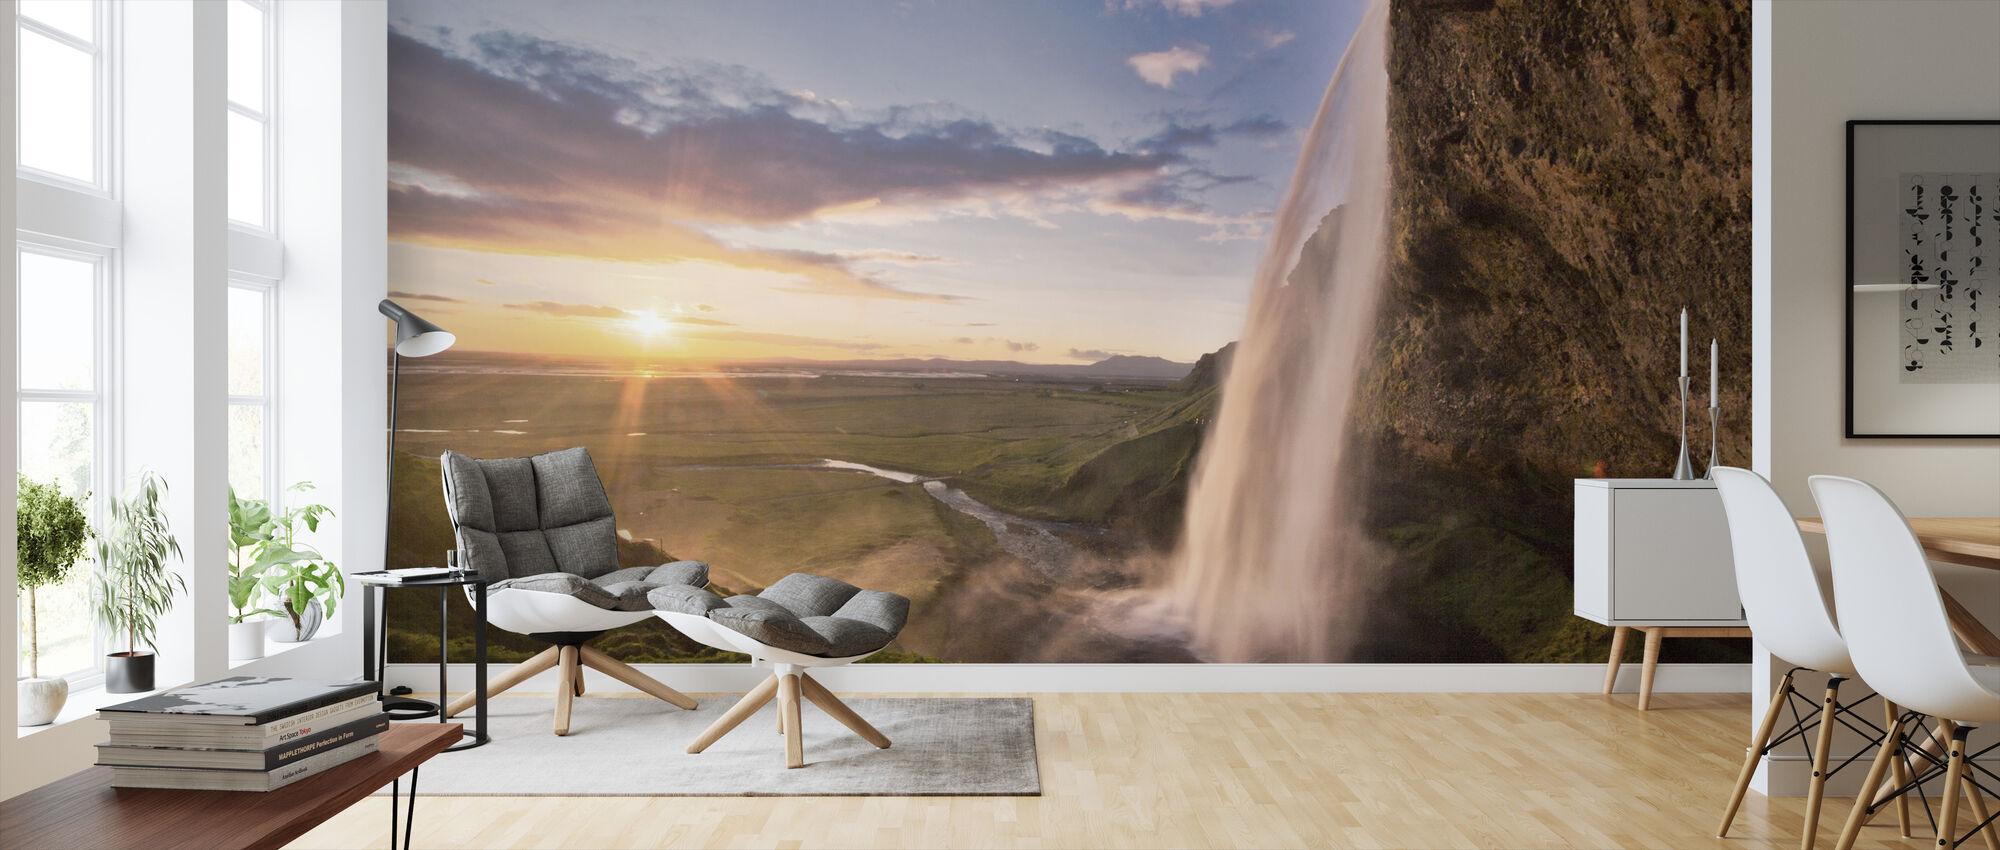 Seljalandsfoss Waterfall in Iceland - Wallpaper - Living Room